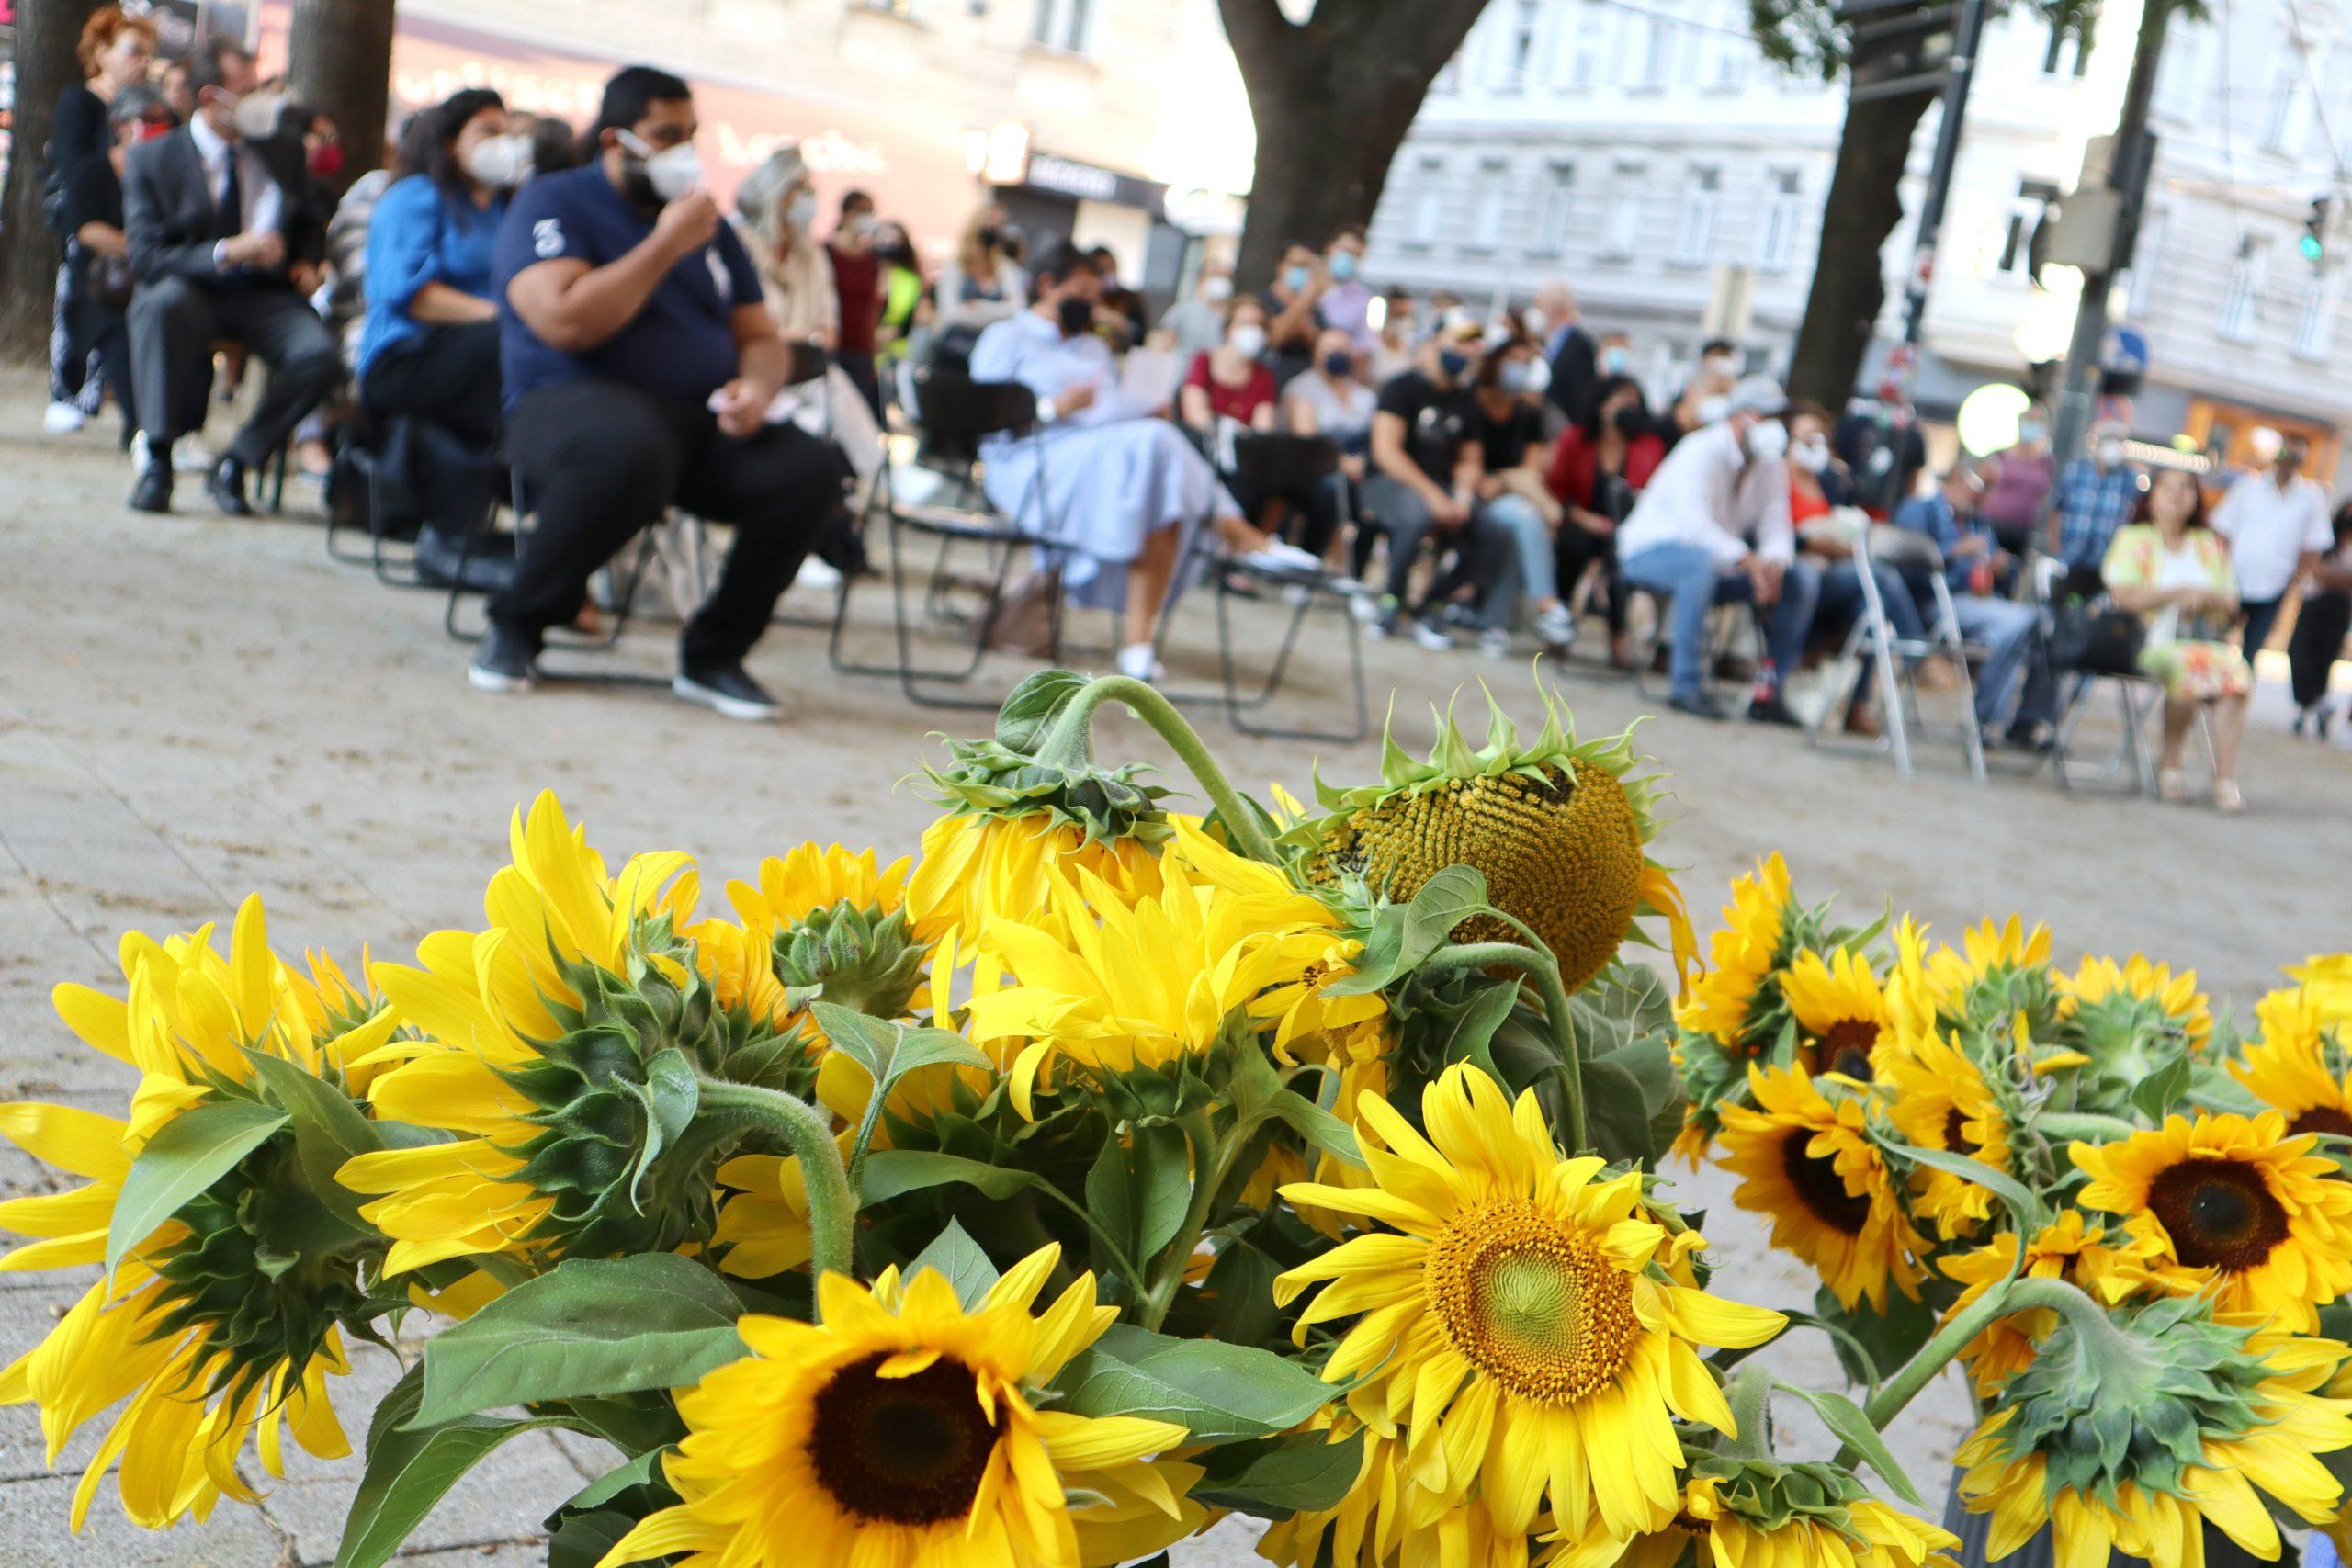 Sonnenblumen waren Ceija Stojkas Lieblingsblumen